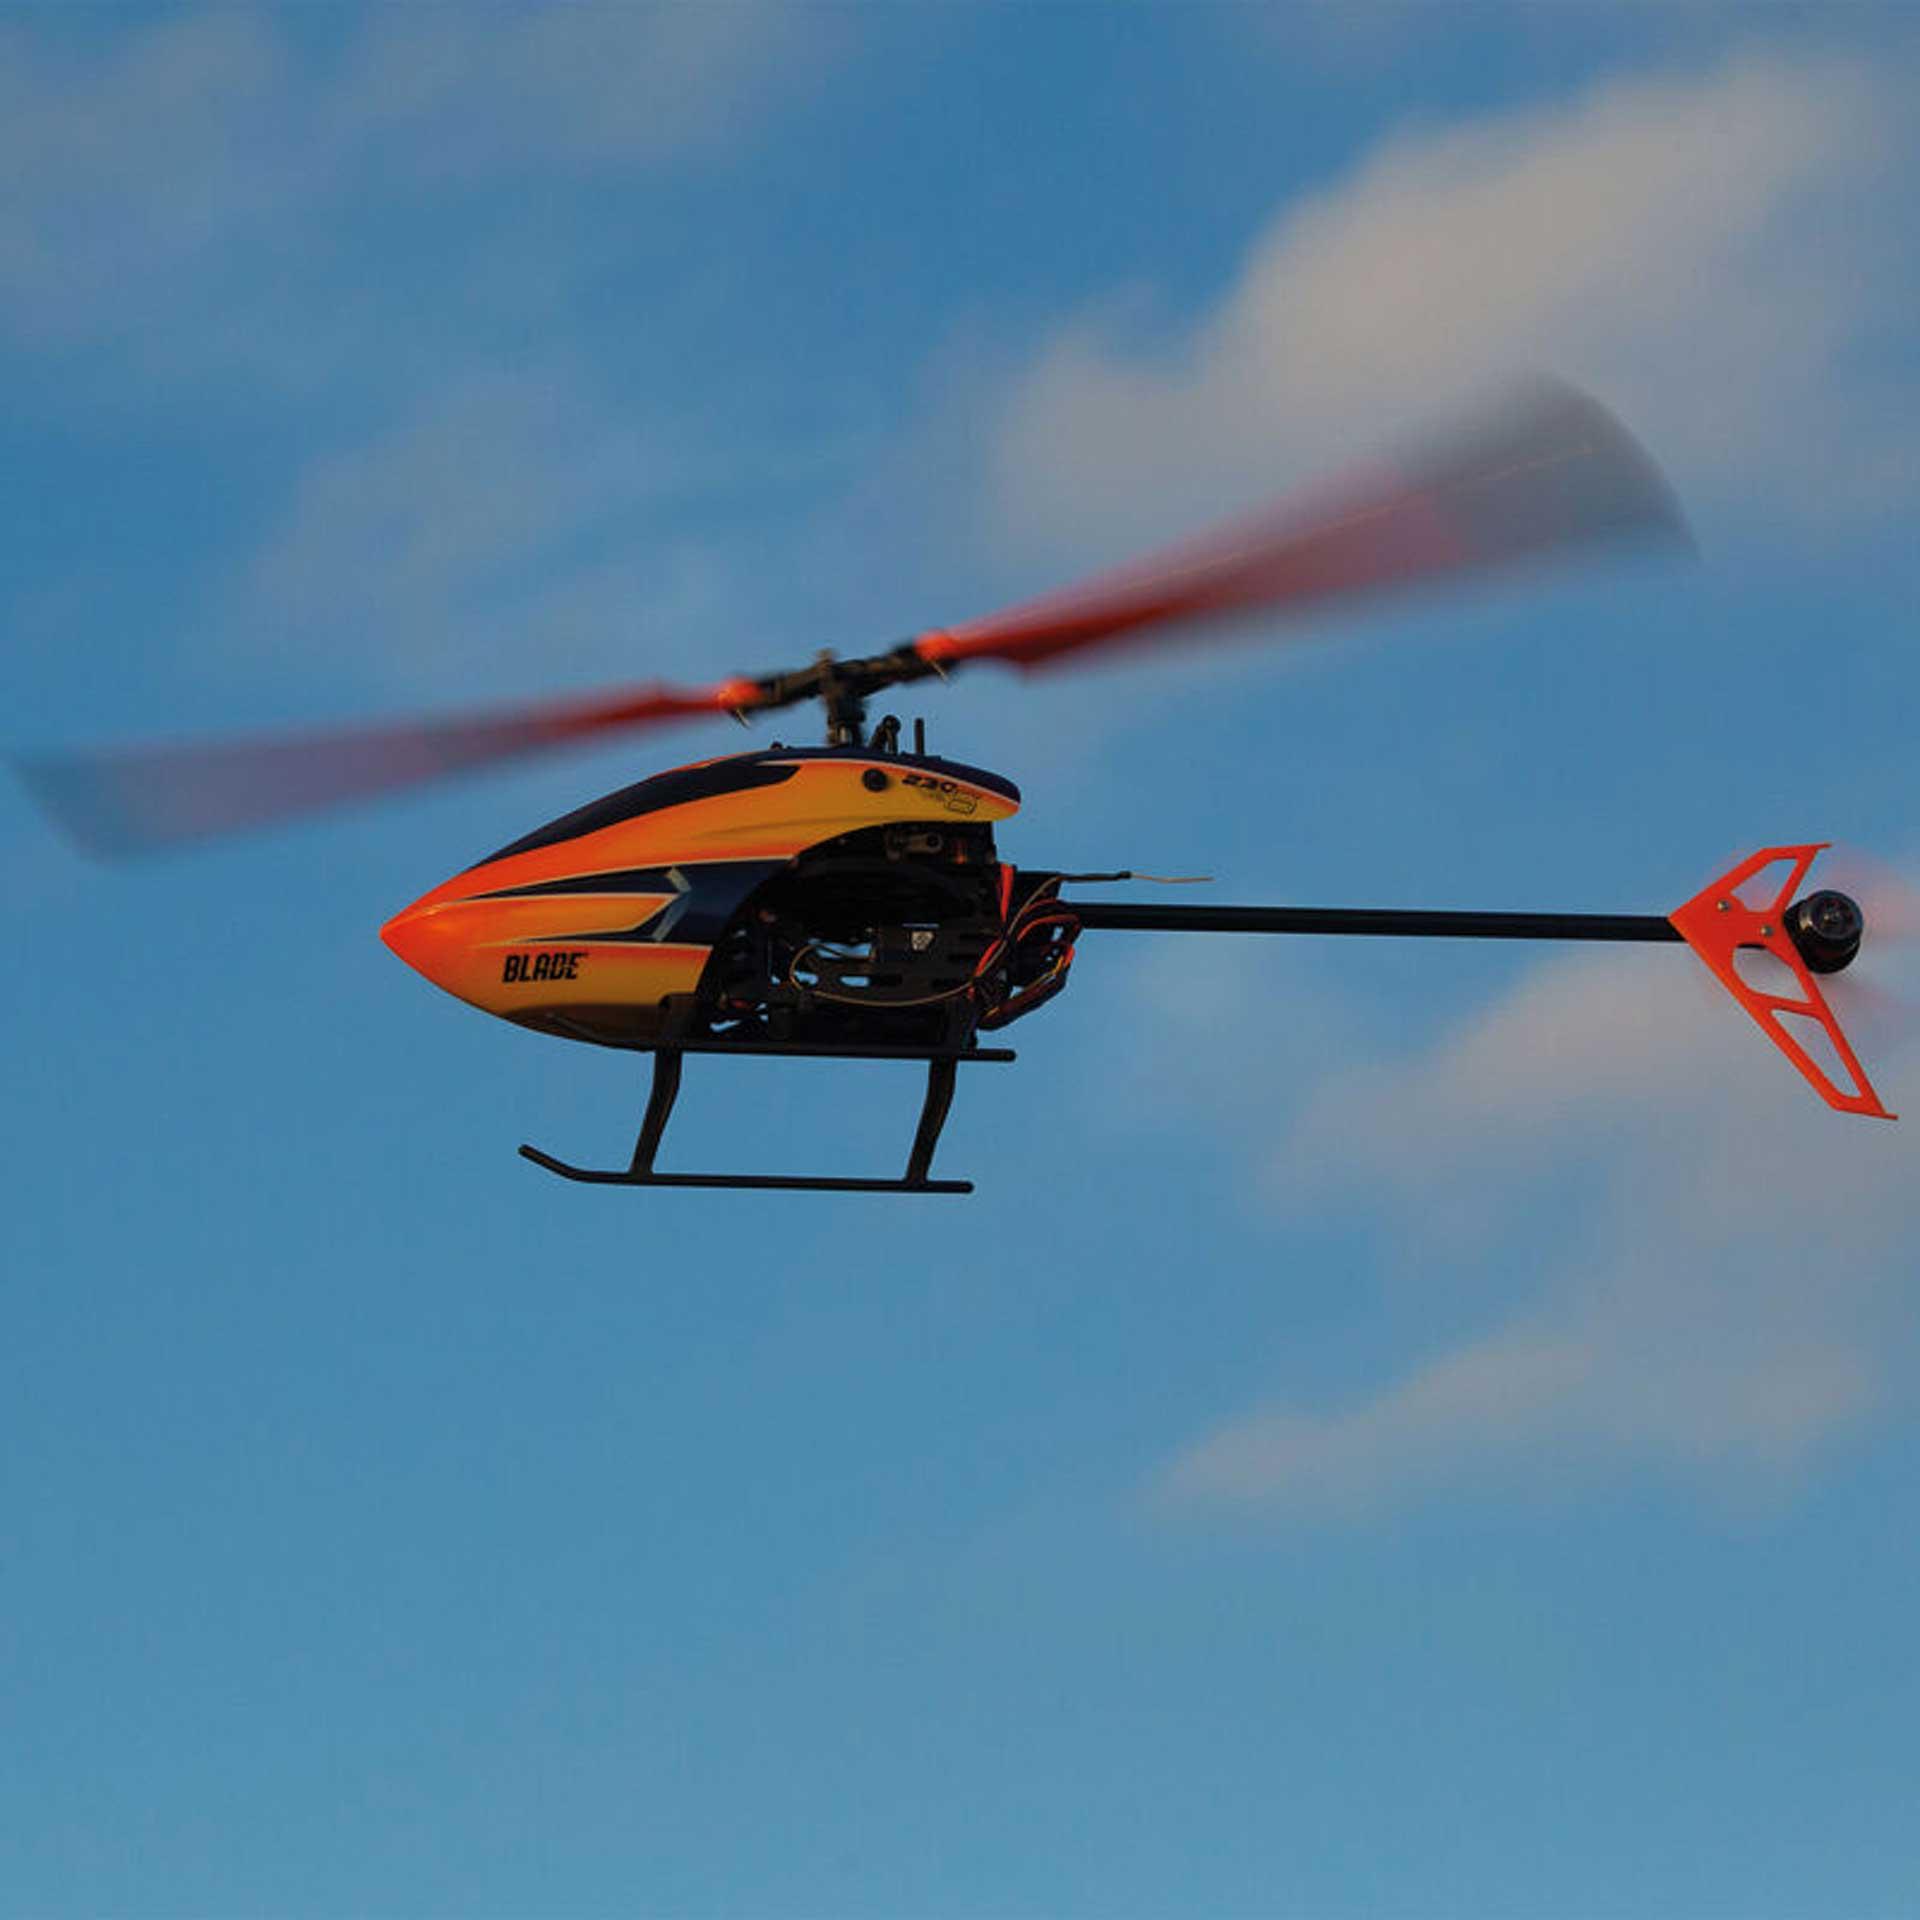 BLADE 230 S Smart RTF Hubschrauber / Helikopter